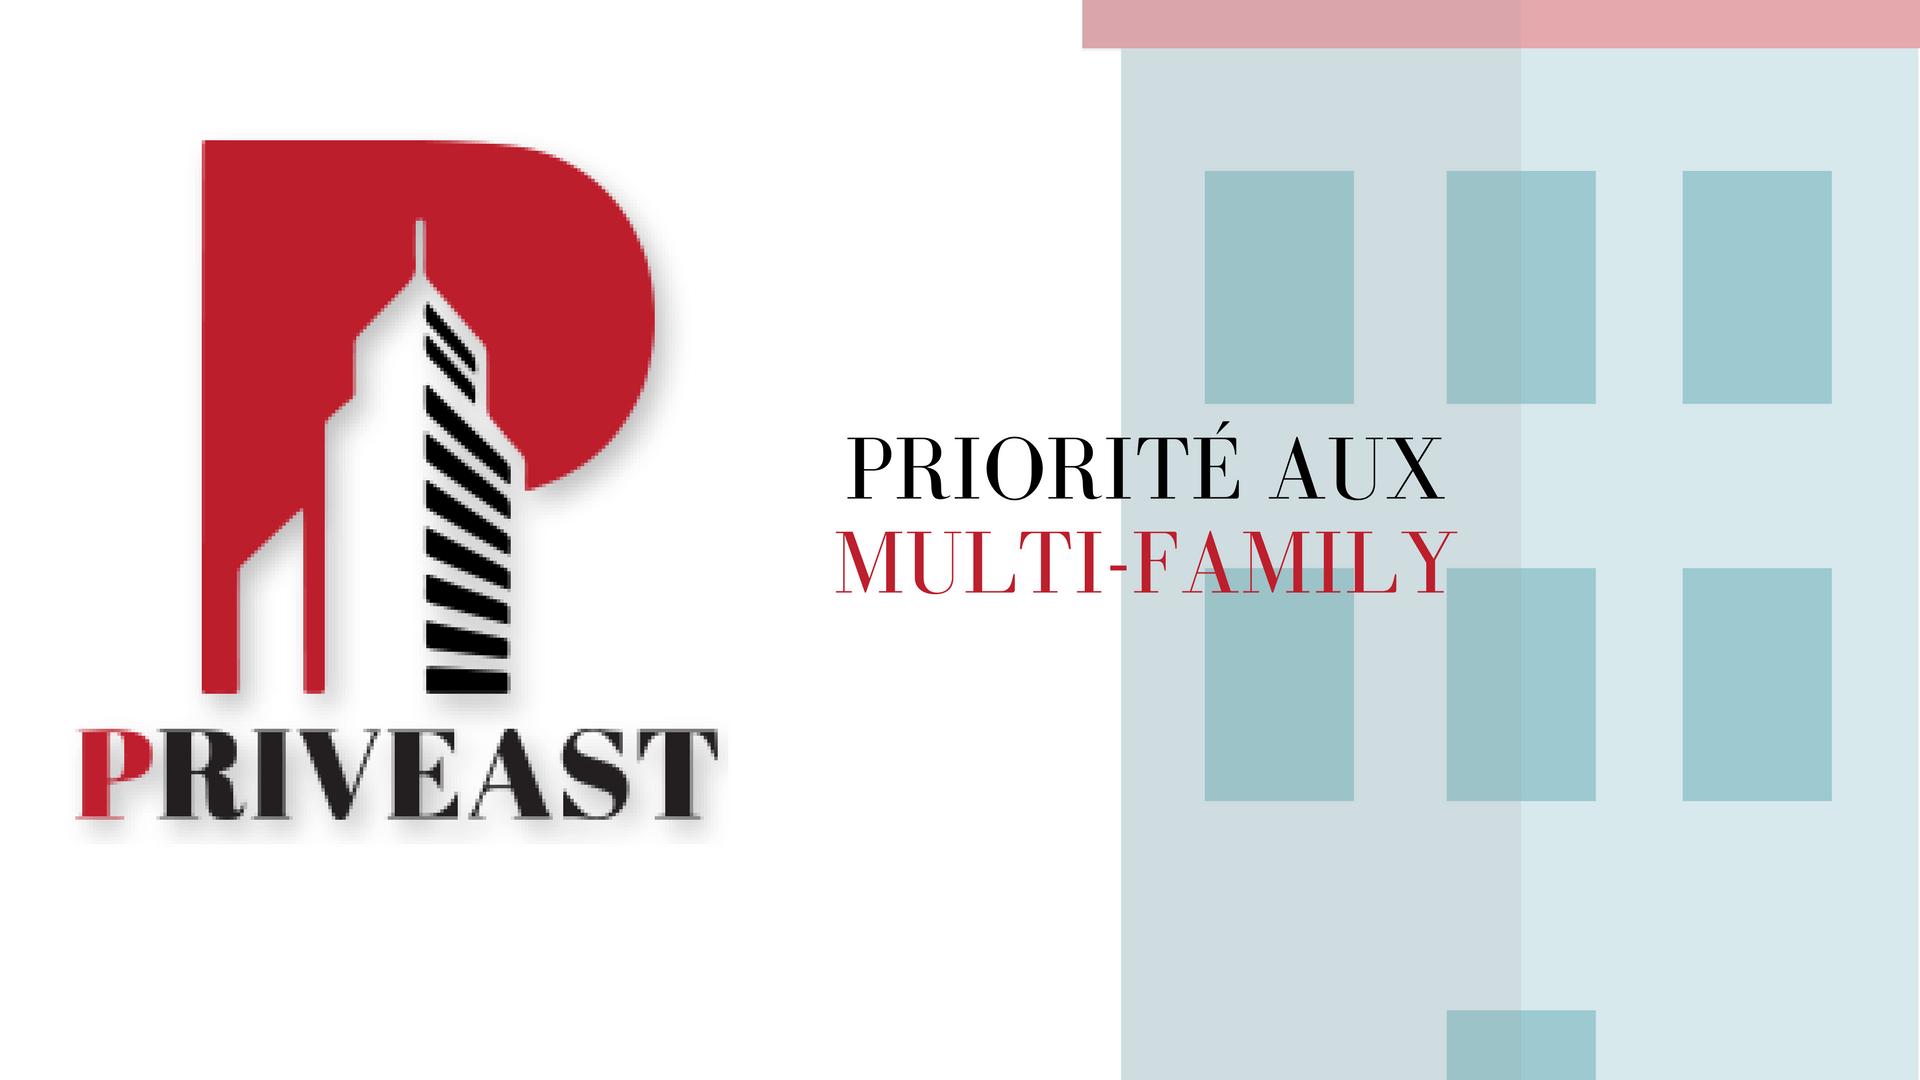 priorité aux multi-family priveast